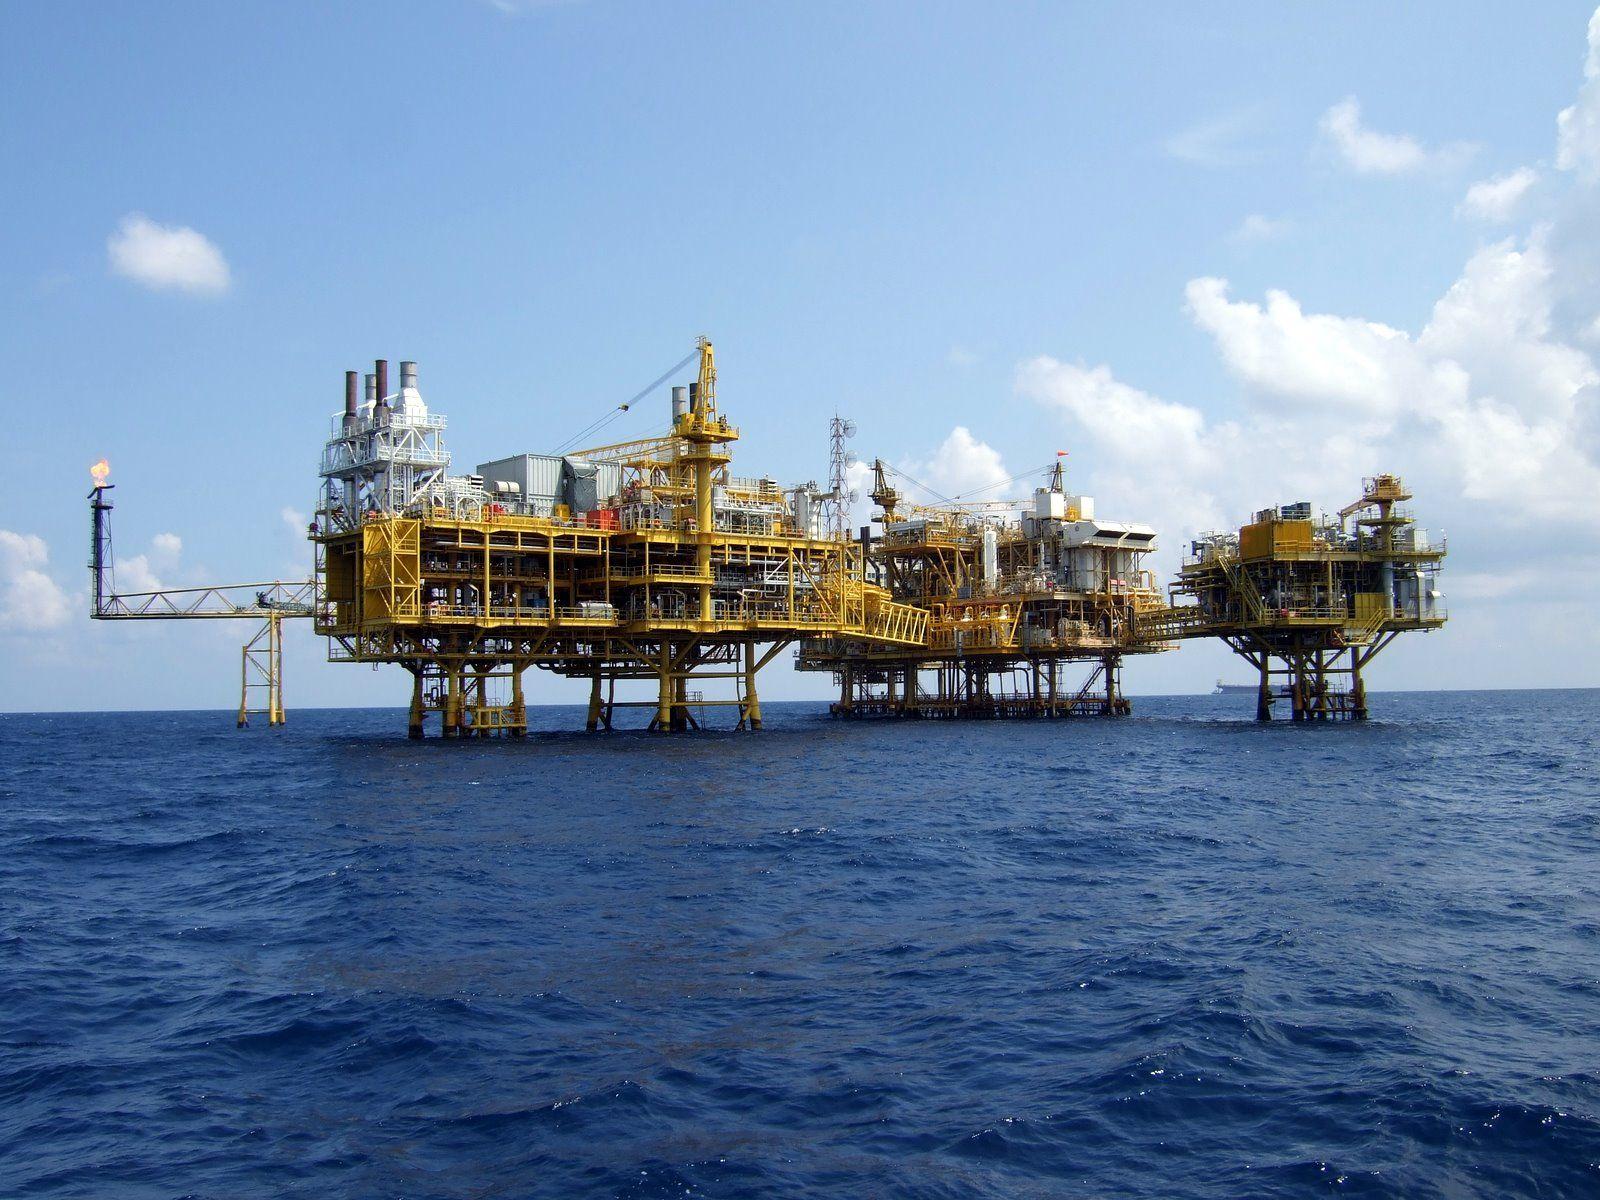 Thai Oil Rig